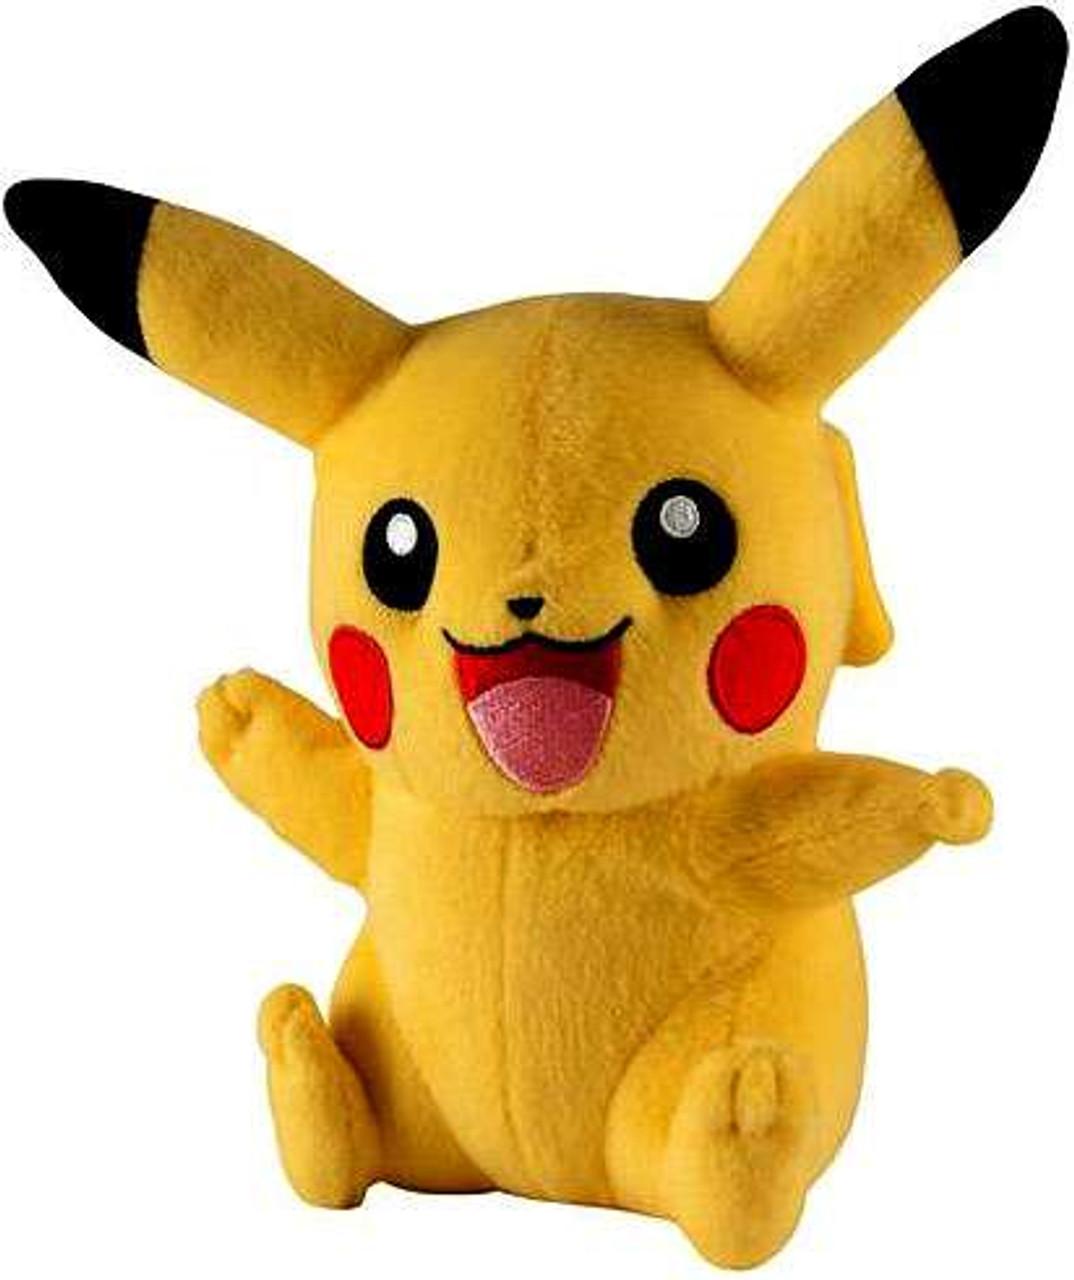 Pokemon Center Japan Limited Robot Pikachu Plush Toy Pouch Set Rare F//S New